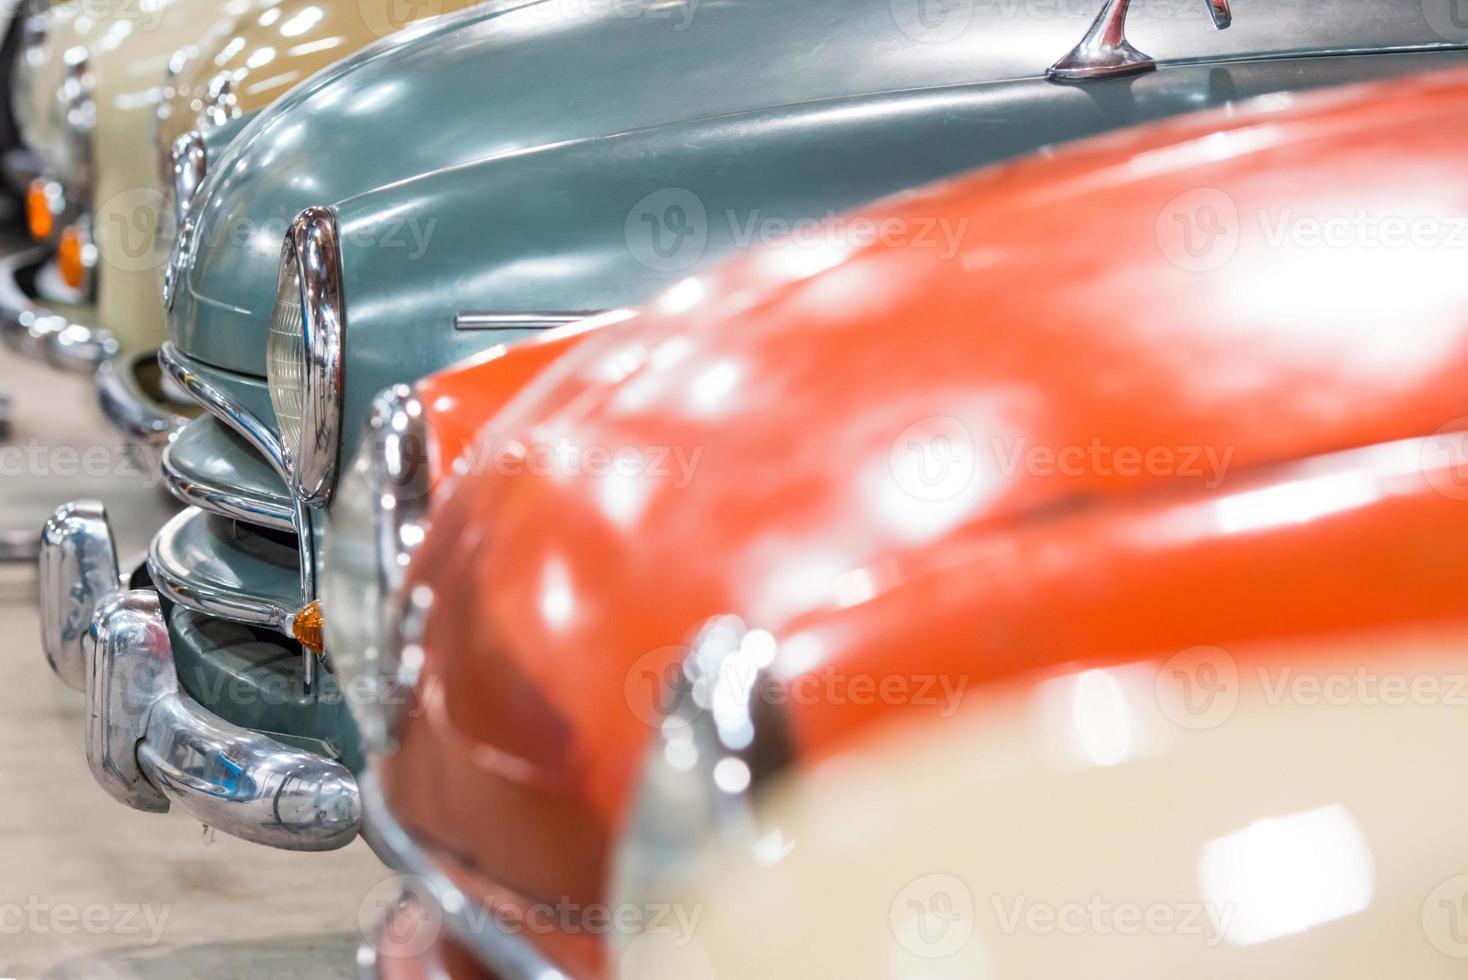 voitures rouges et blanches photo